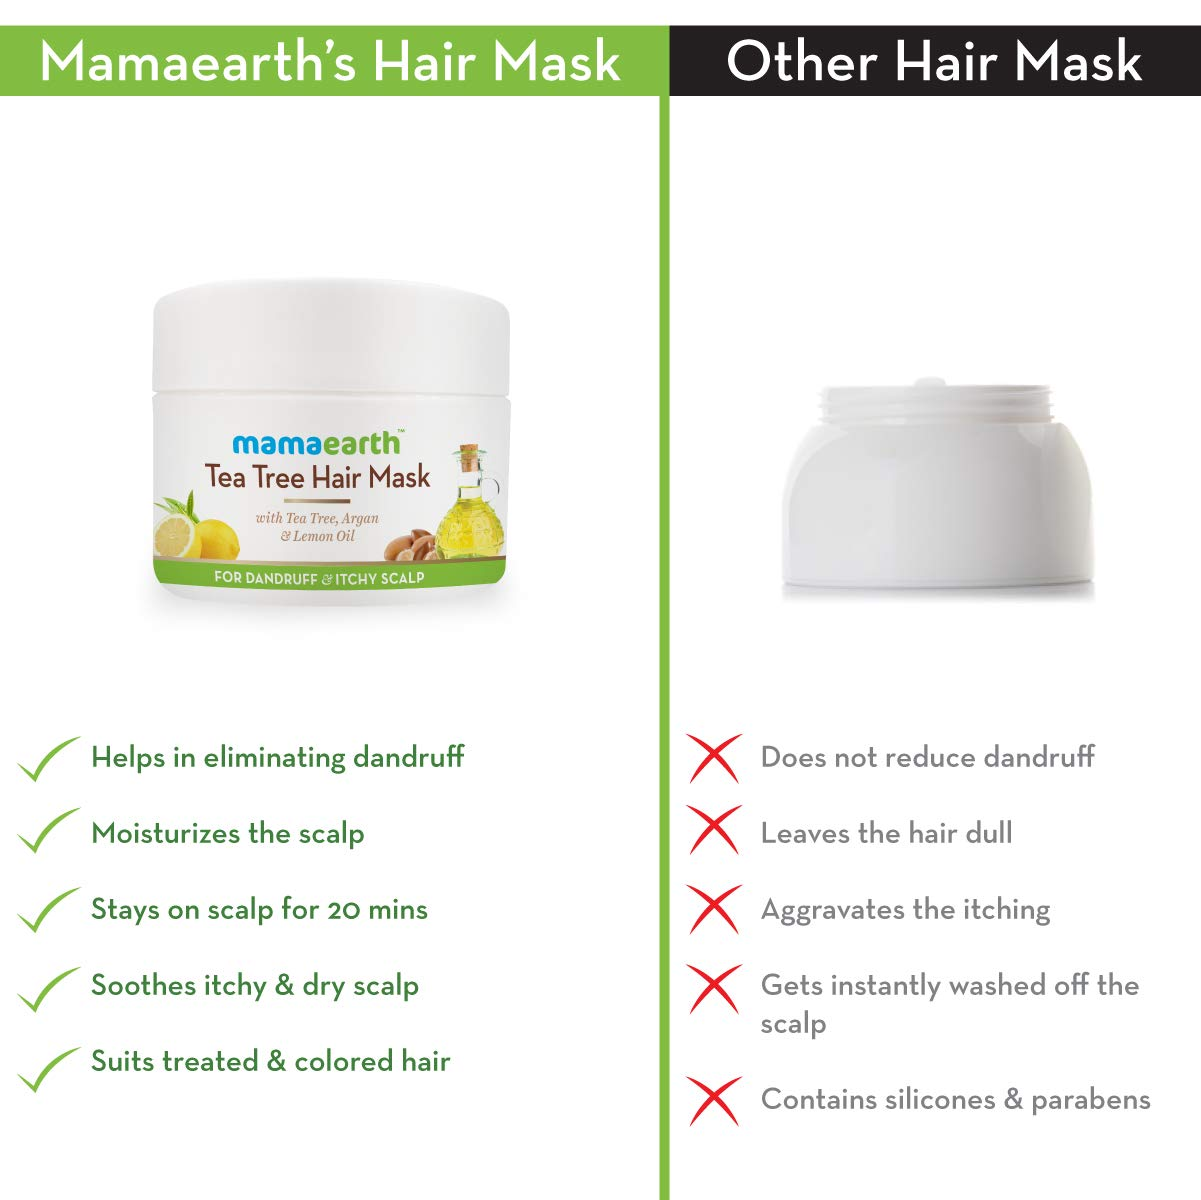 Mamaearth Anti Dandruff Tea Tree Hair Mask With Tea Tree And Lemon Oil For Danrduff Control And Itch Treatement 200ml Amazon In Beauty